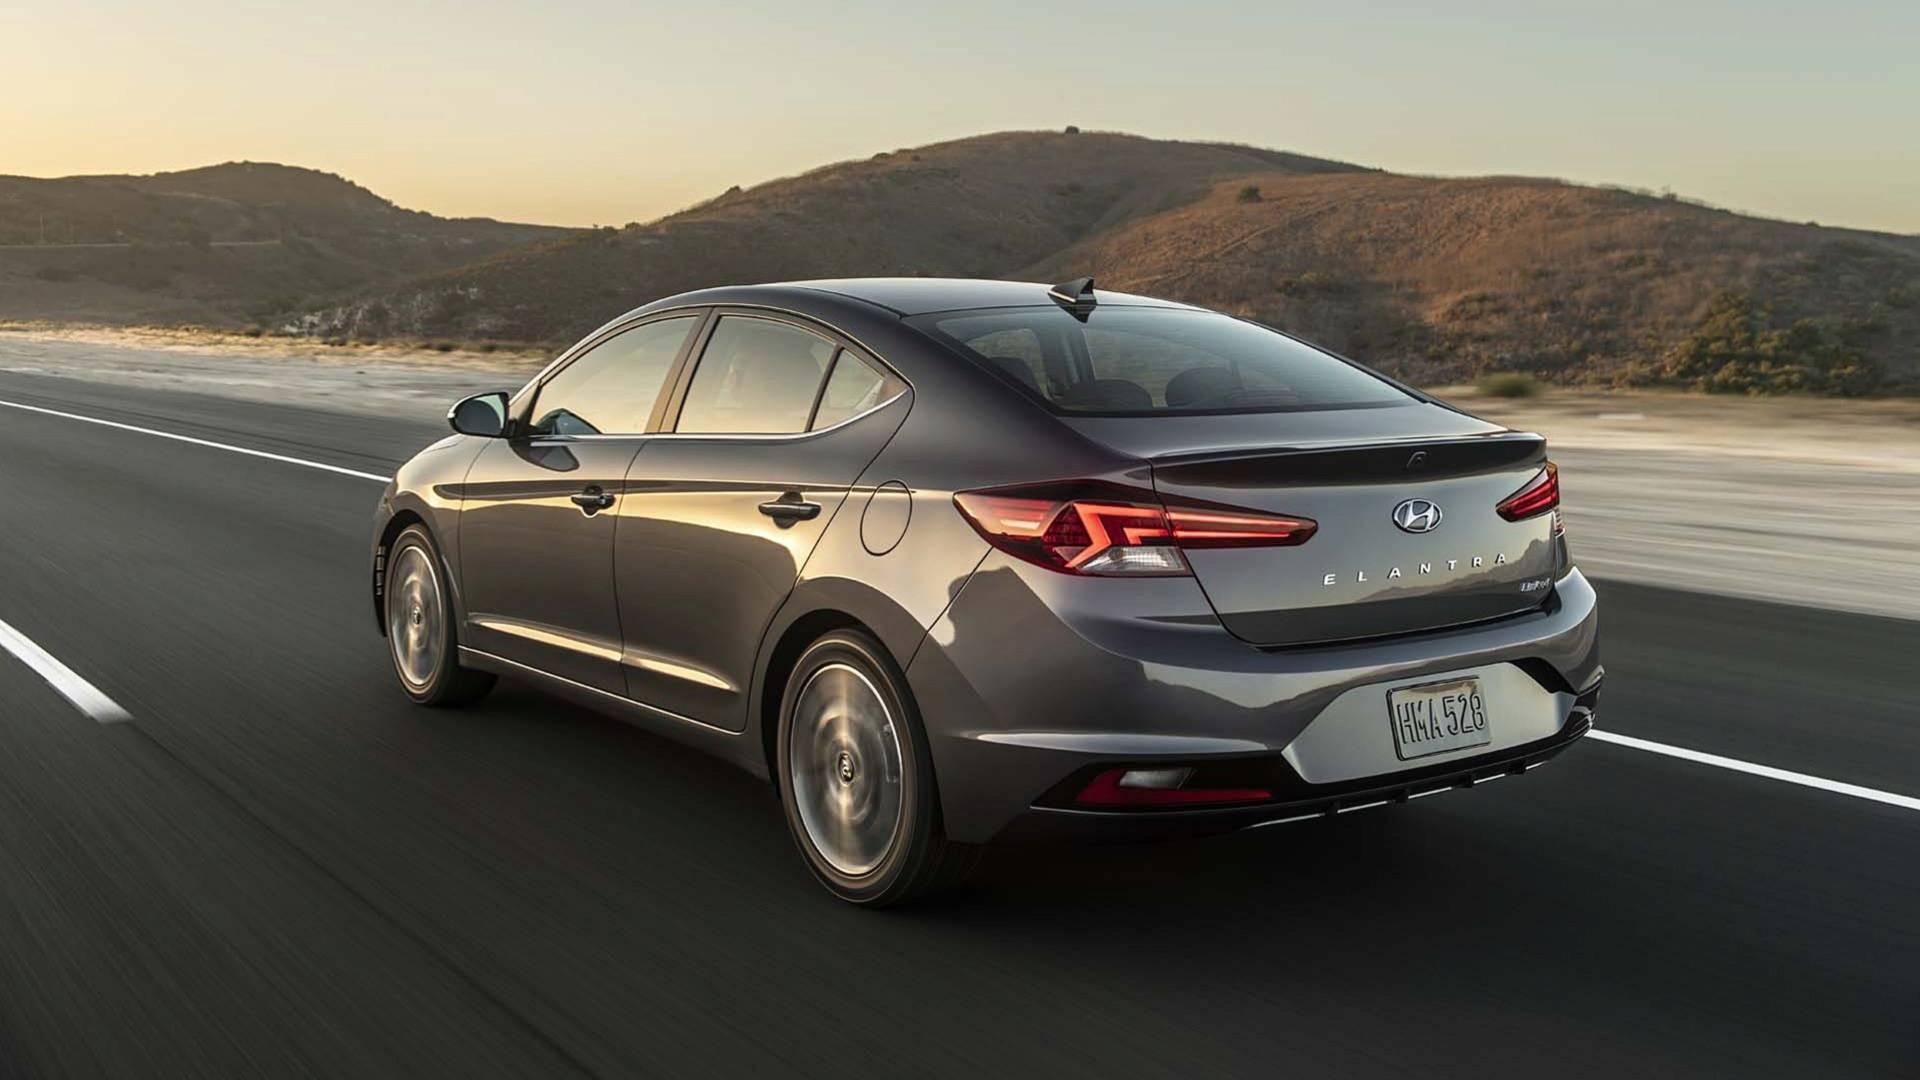 2019 Hyundai Elantra Pricing Gets You More Bang For Your Buck